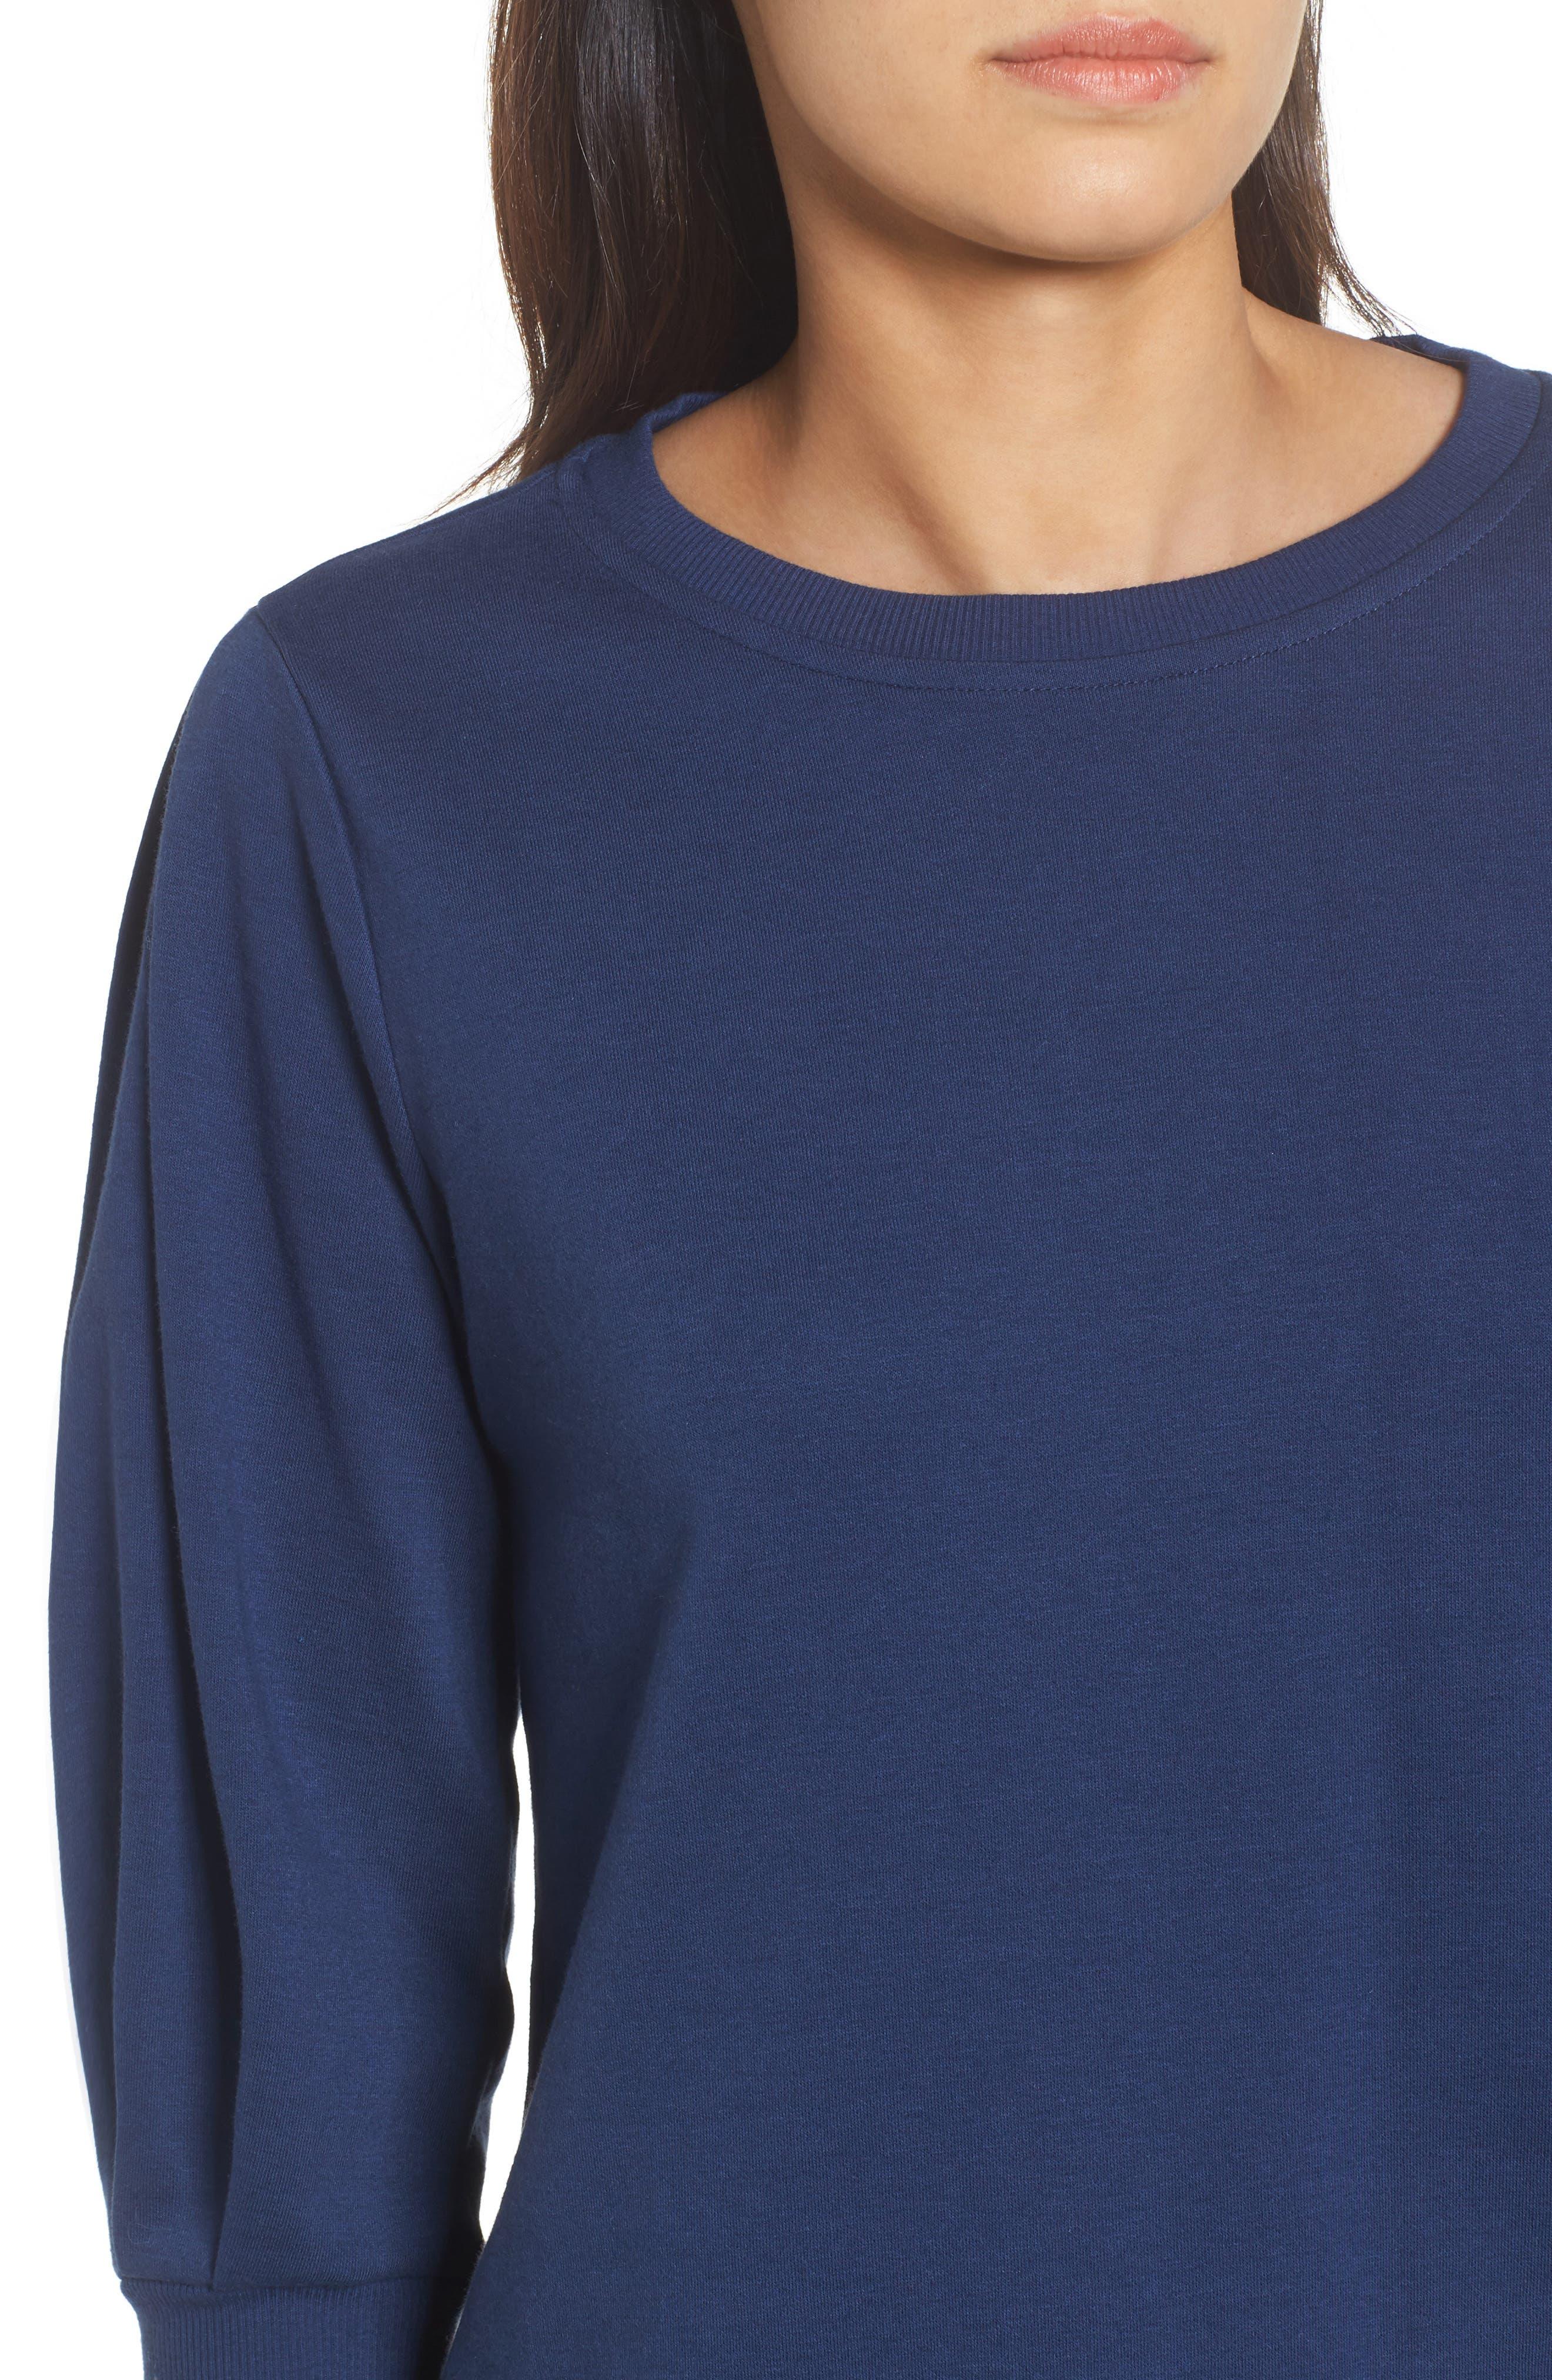 Blouson Sleeve Sweatshirt,                             Alternate thumbnail 19, color,